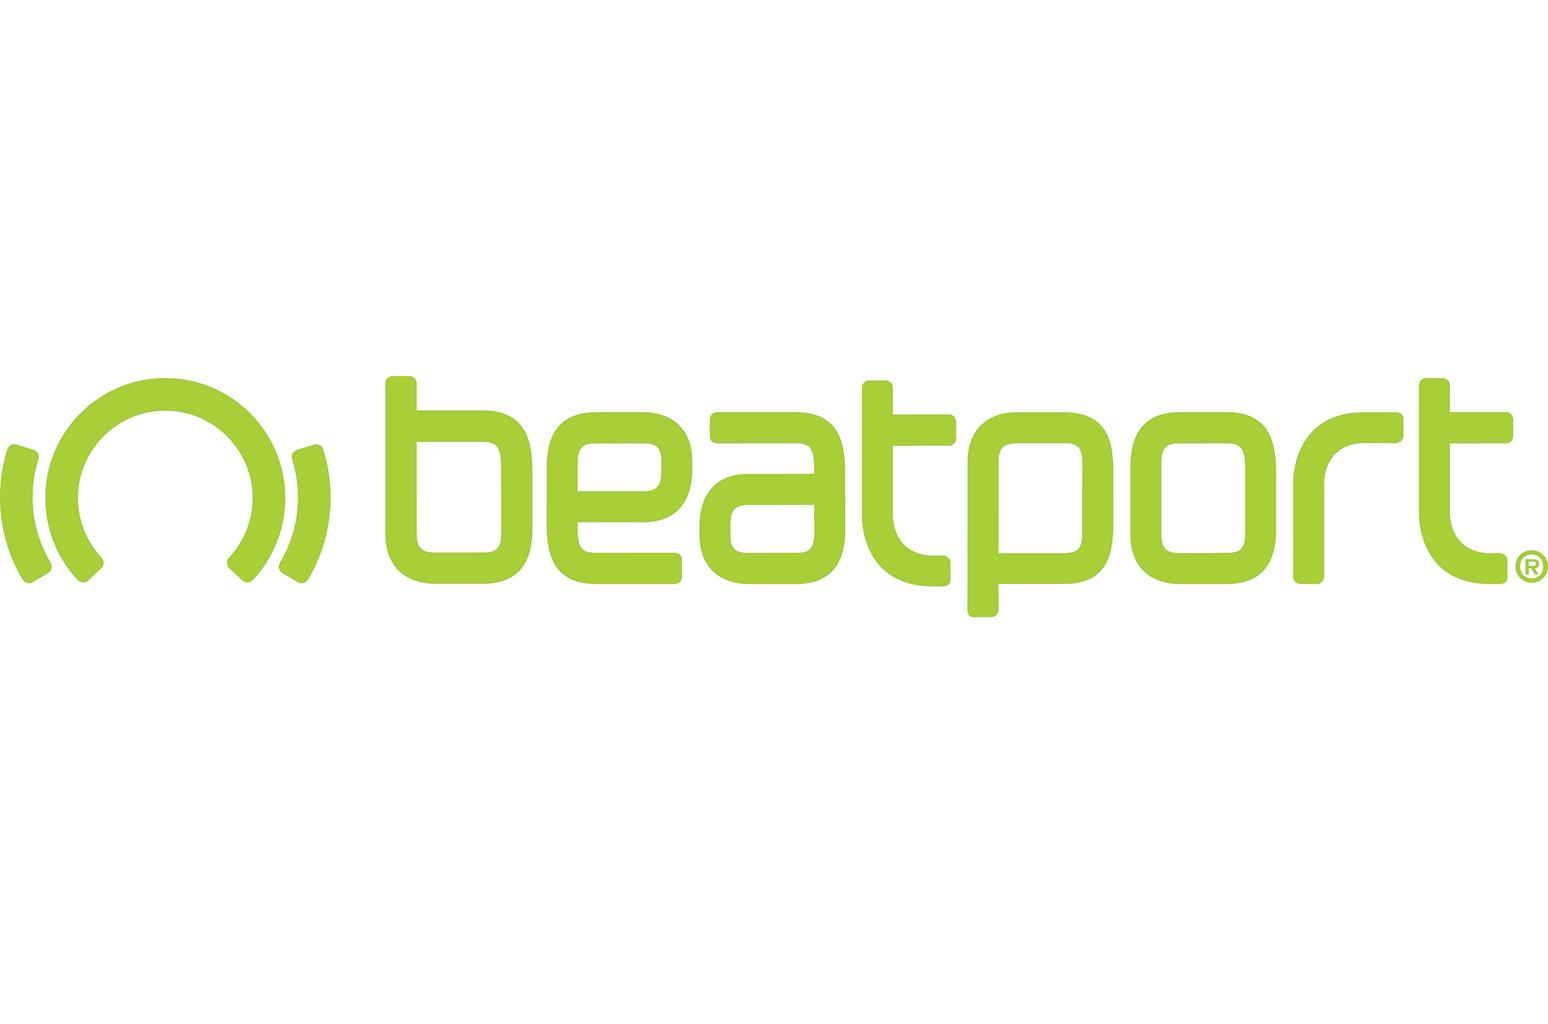 beatport-logo-w-2018-billboard-1548.jpg